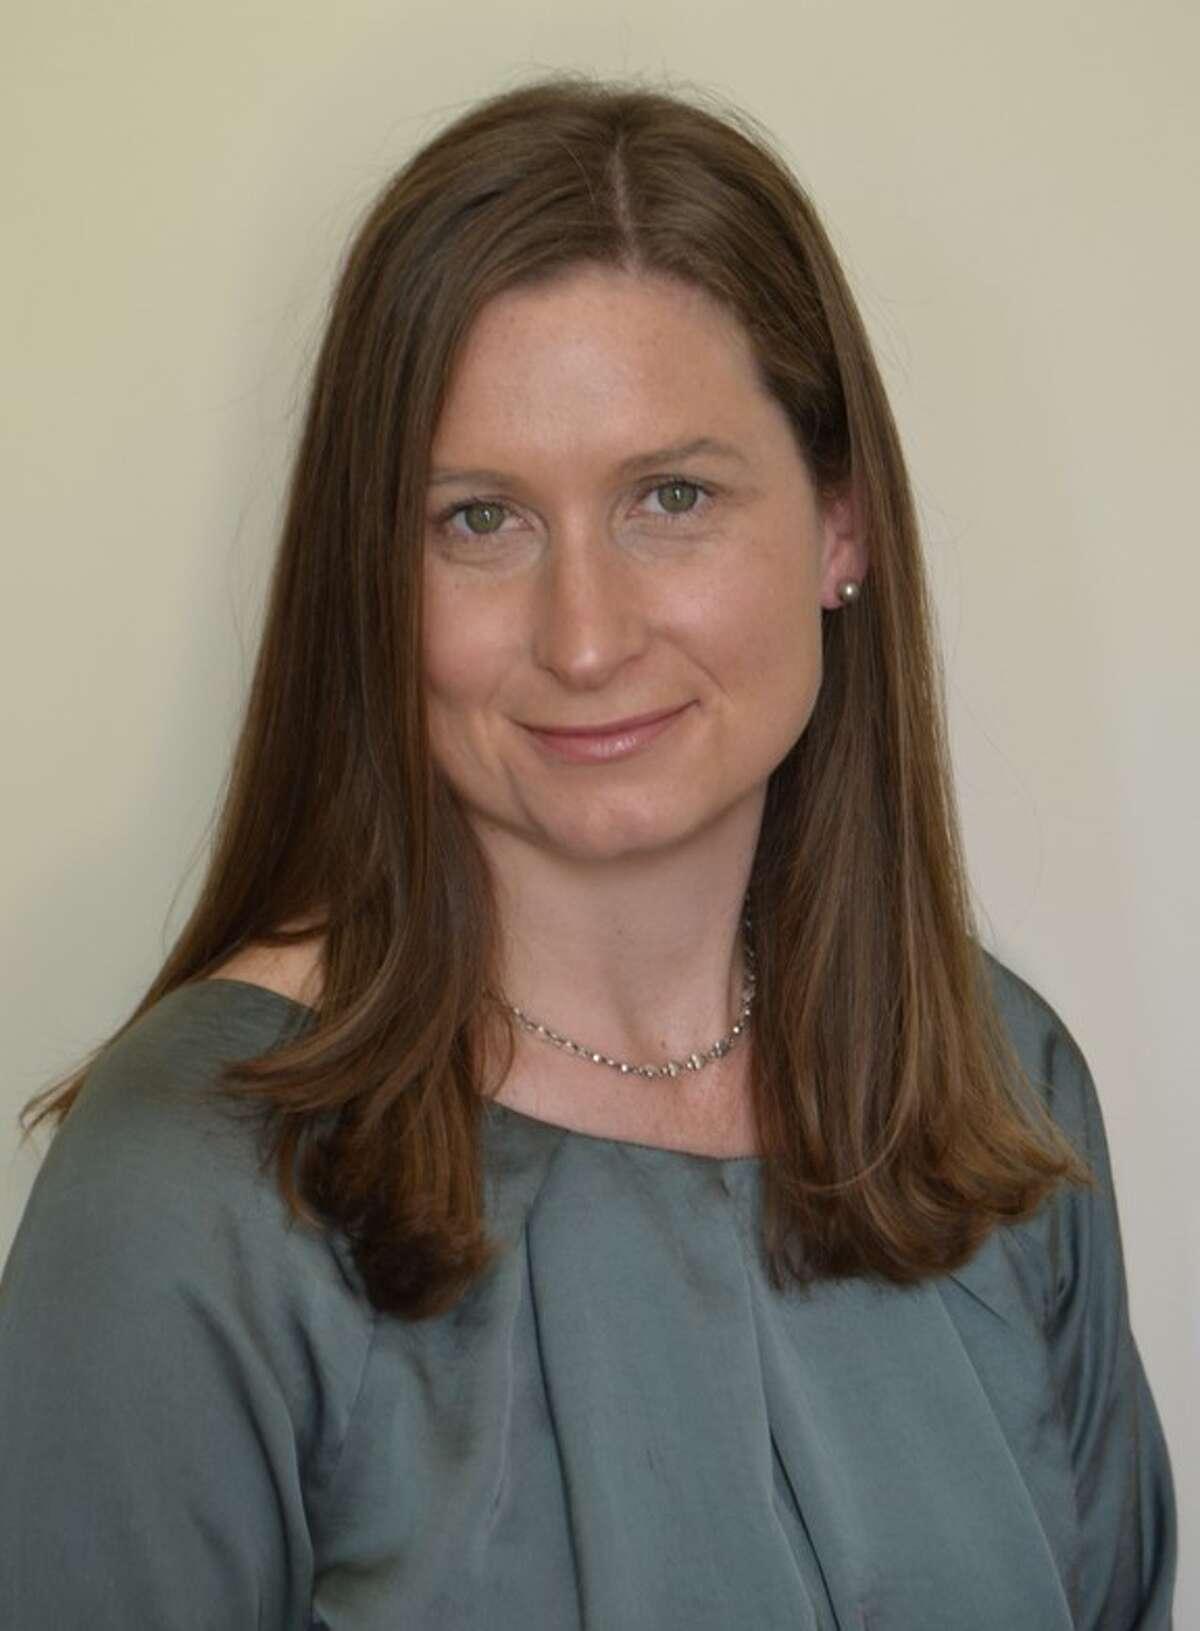 Vanessa Ryan, a senior adviser for Chevron, is program chair of The Environmental Partnership.